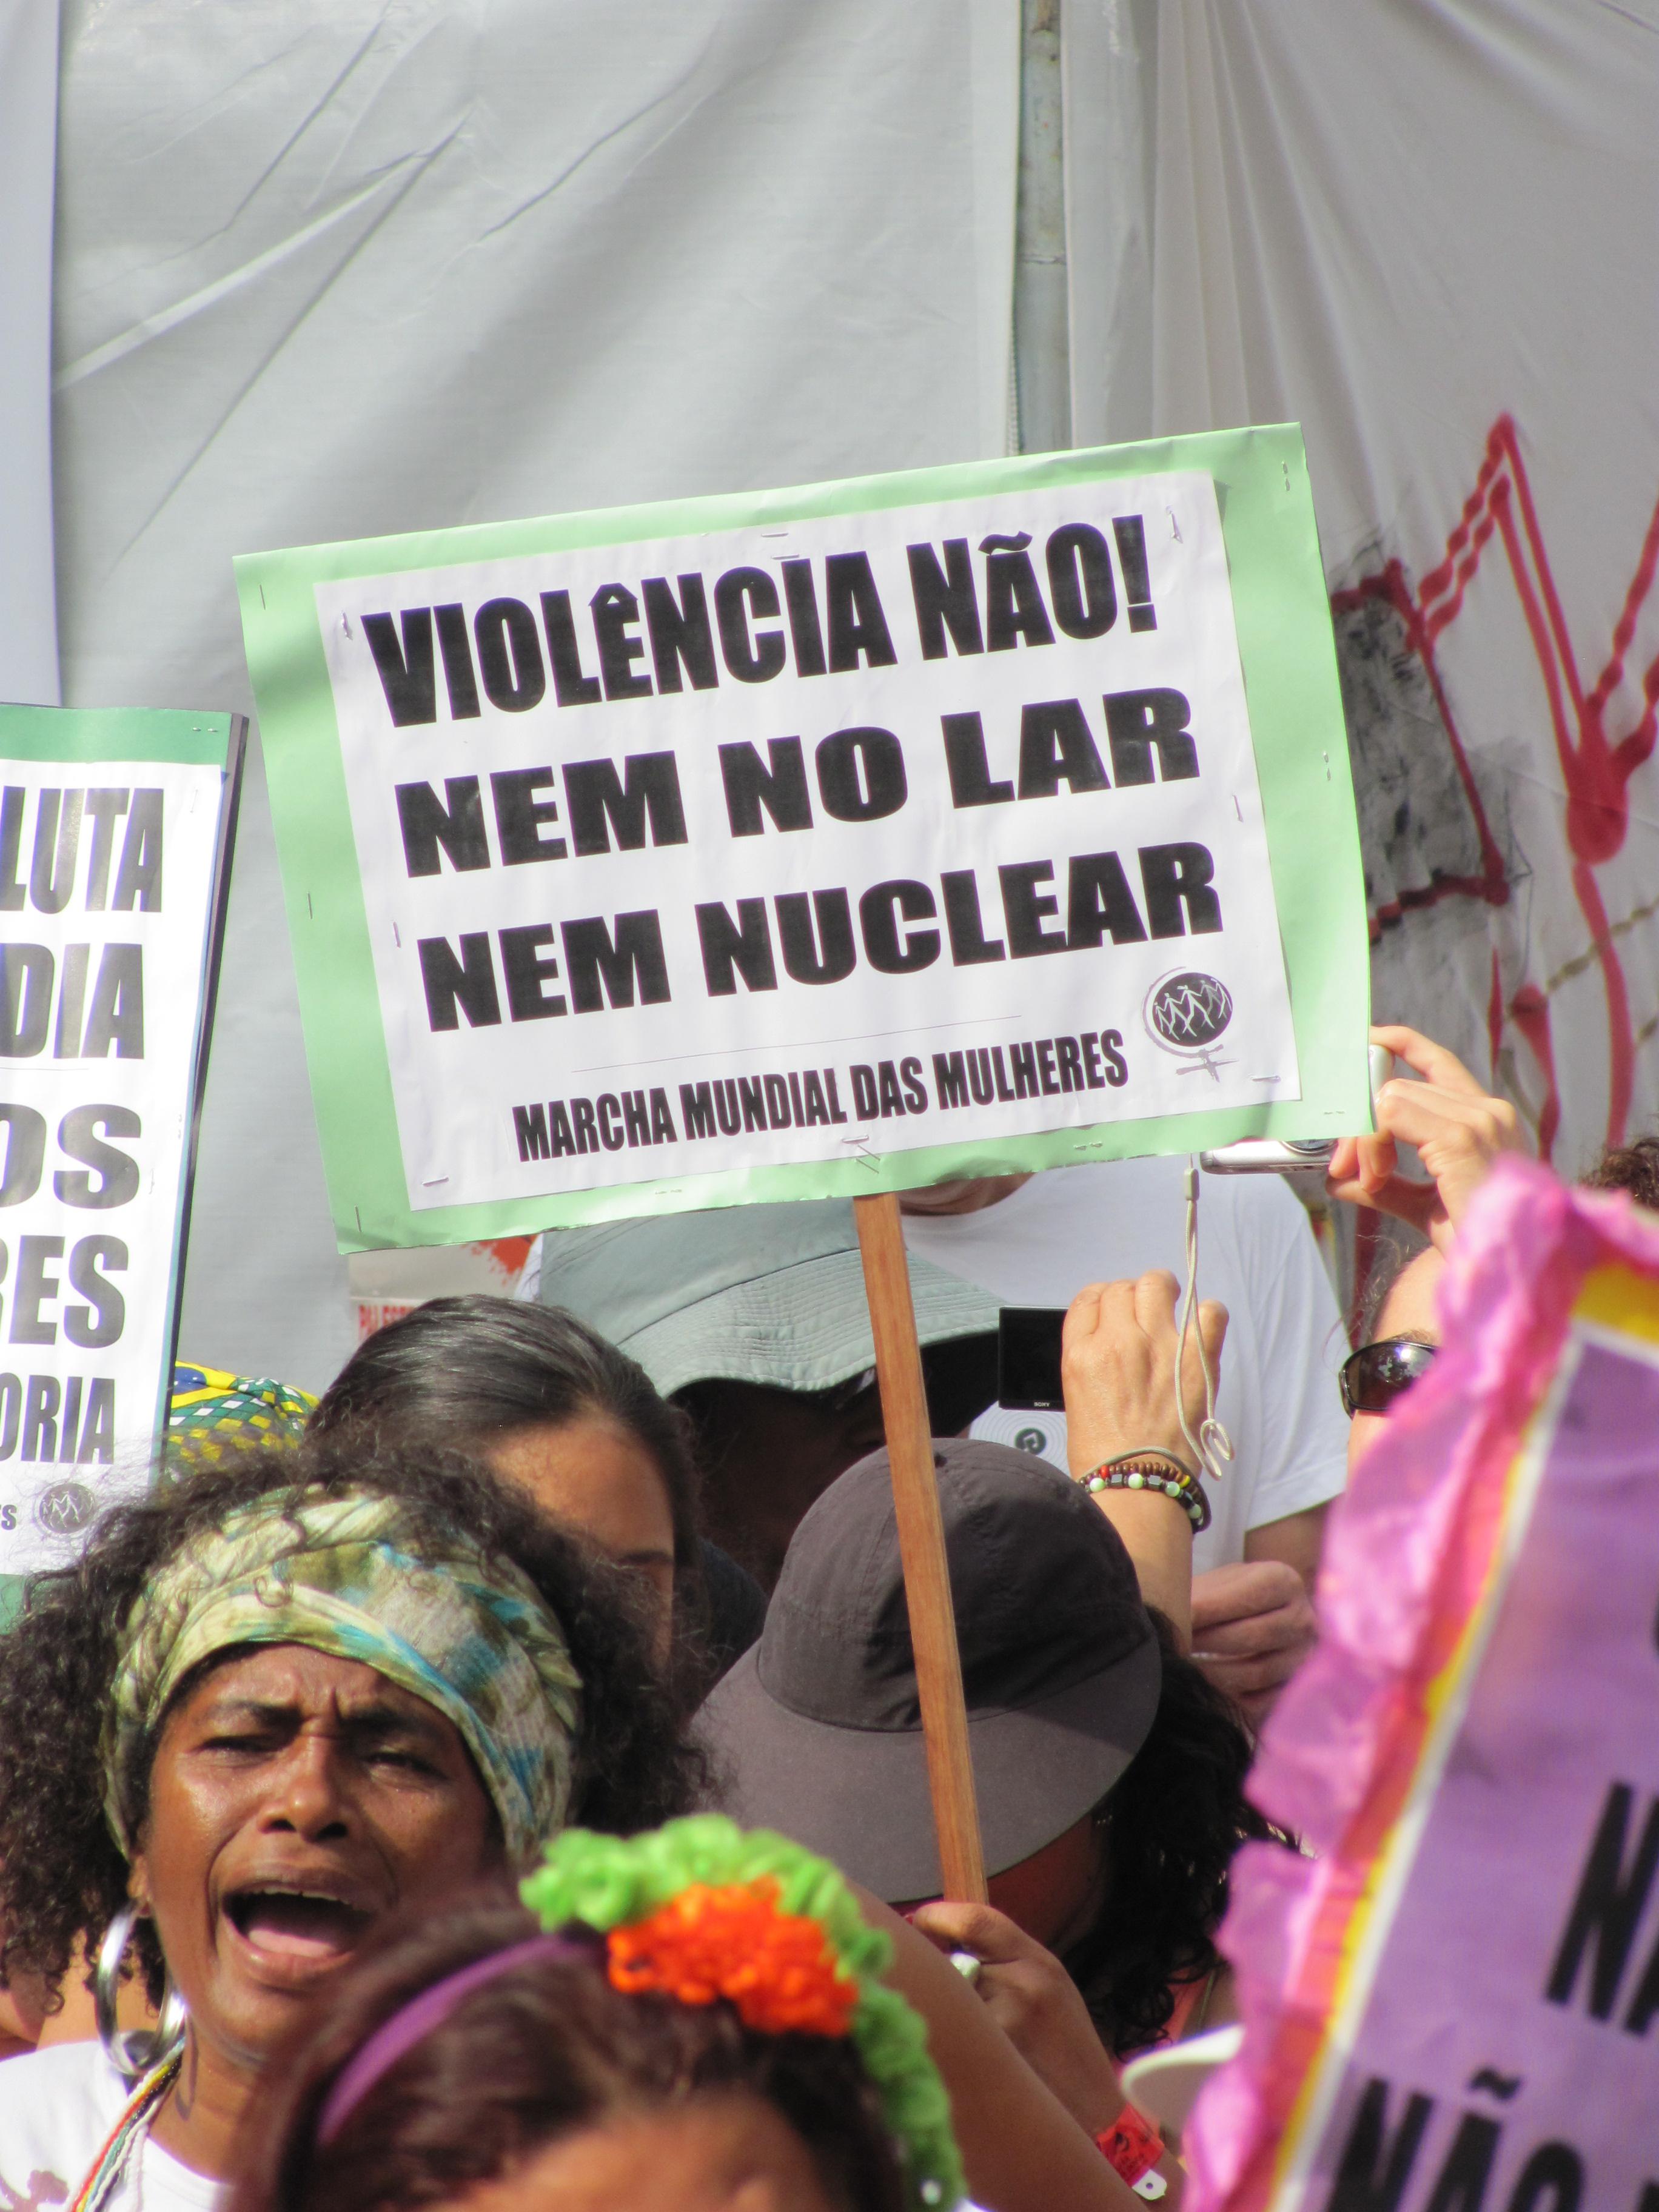 Marcha Mundial das Mulheres na Cúpula dos Povos, na Rio+20